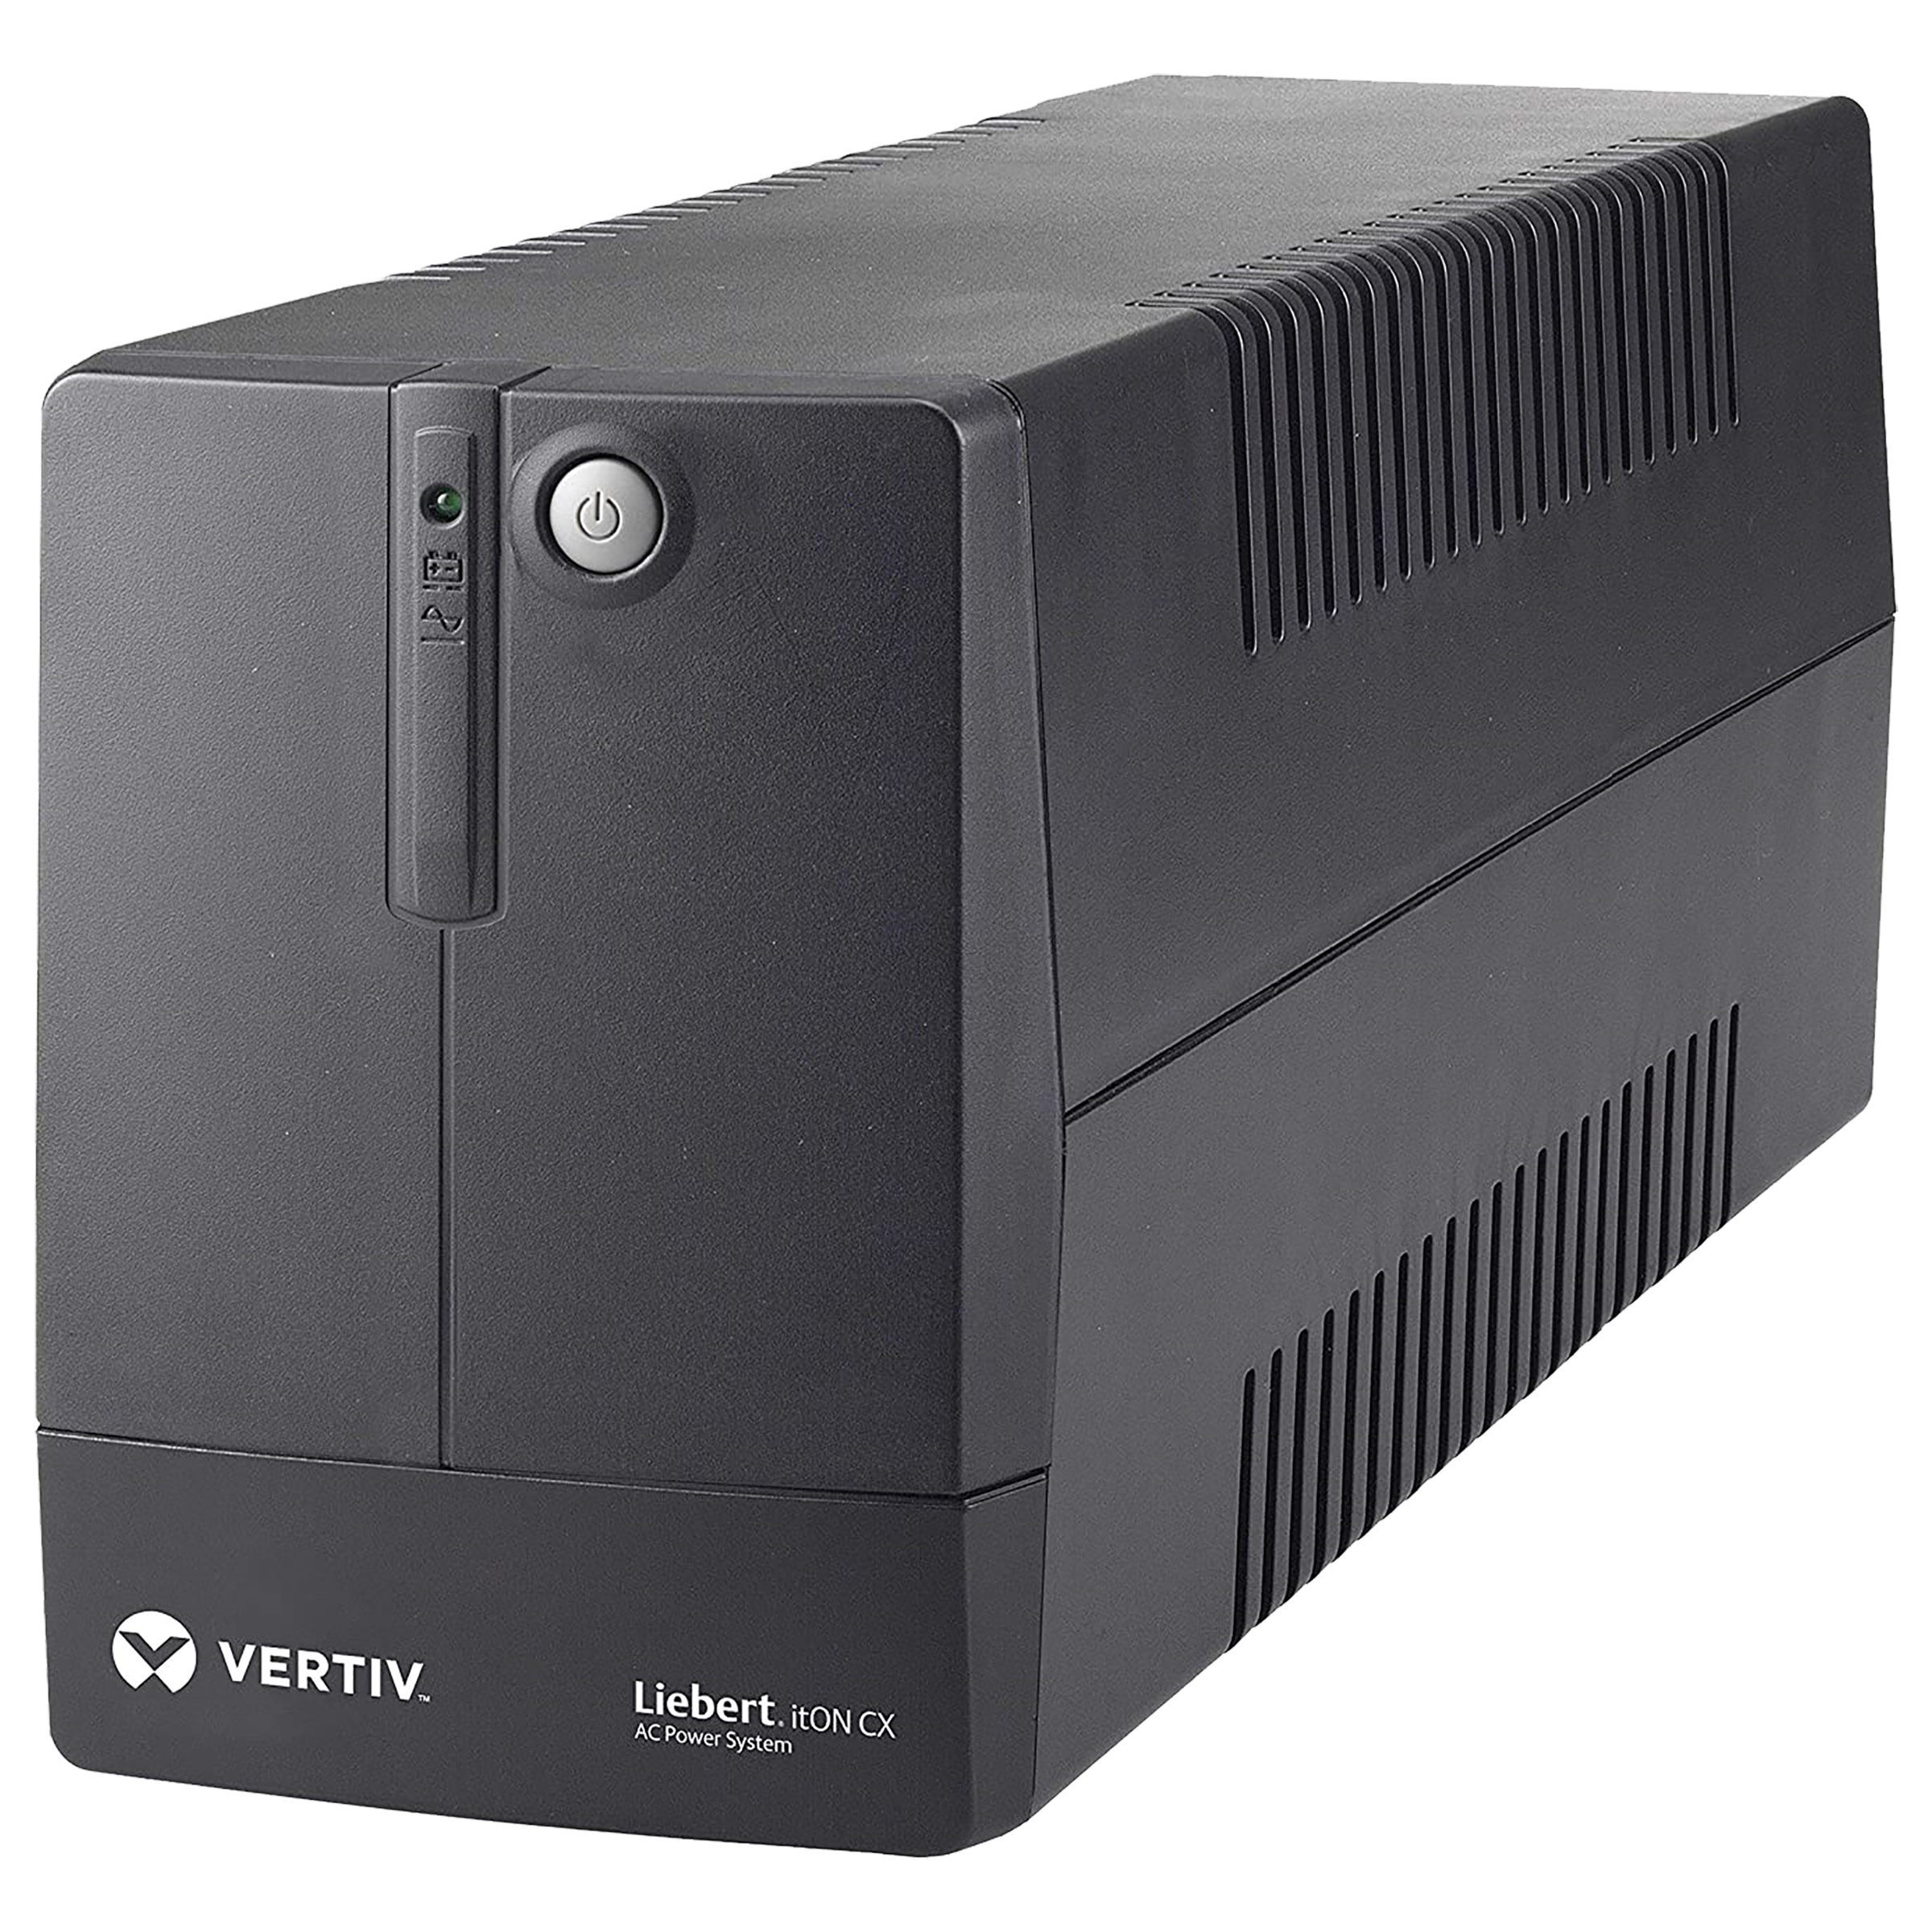 Vertiv Emerson Liebert iton 2.6 Amps UPS (Overload Protection, CX600, Black)_1